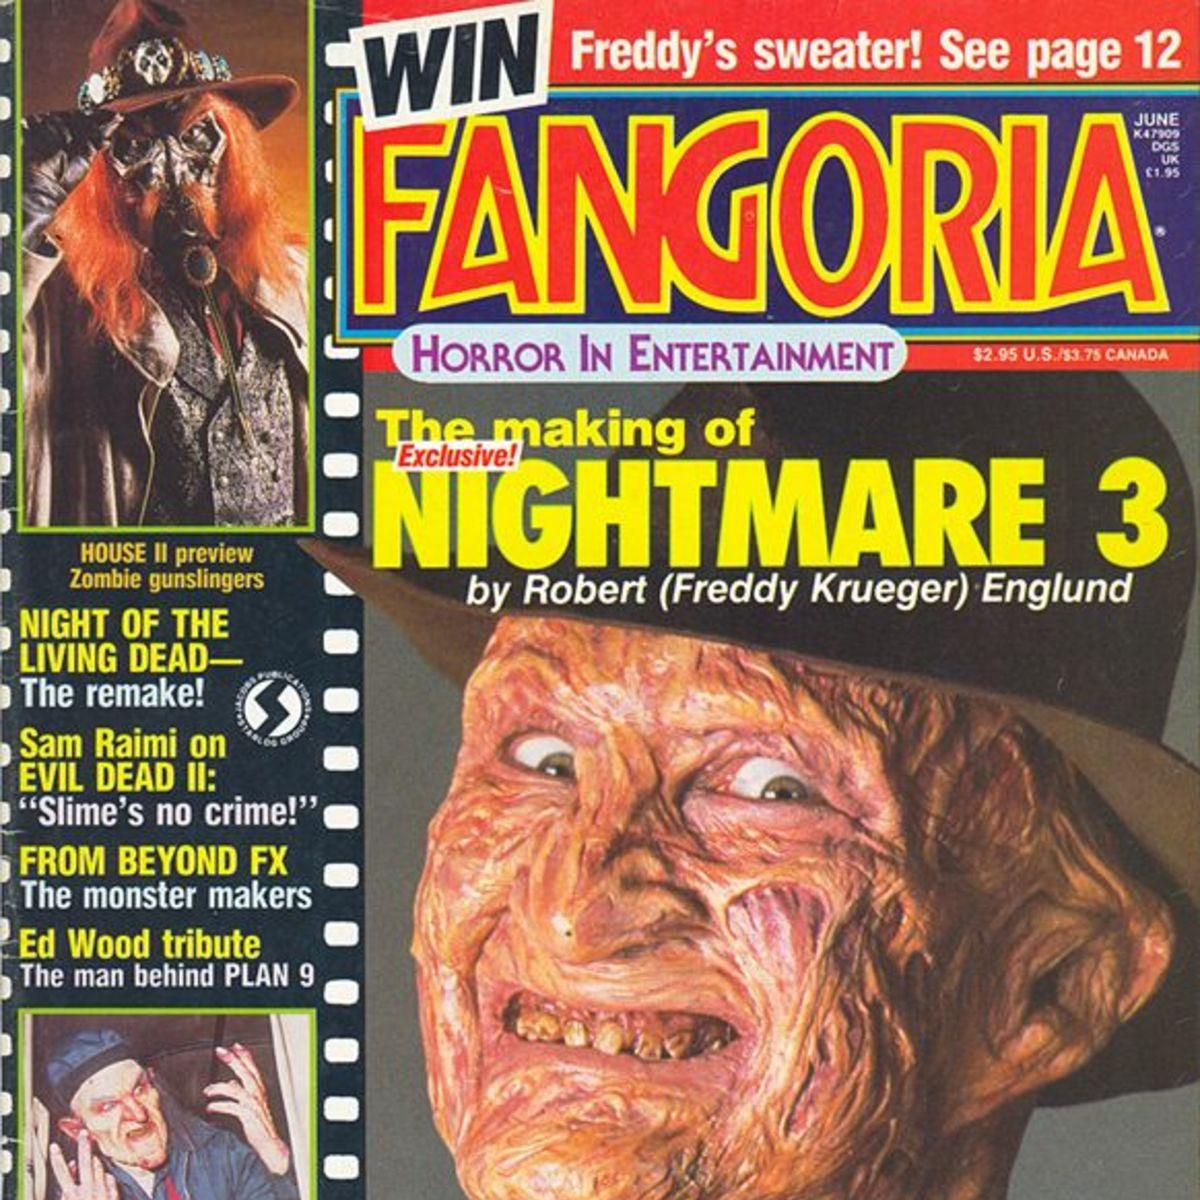 fangoria_cover.jpg